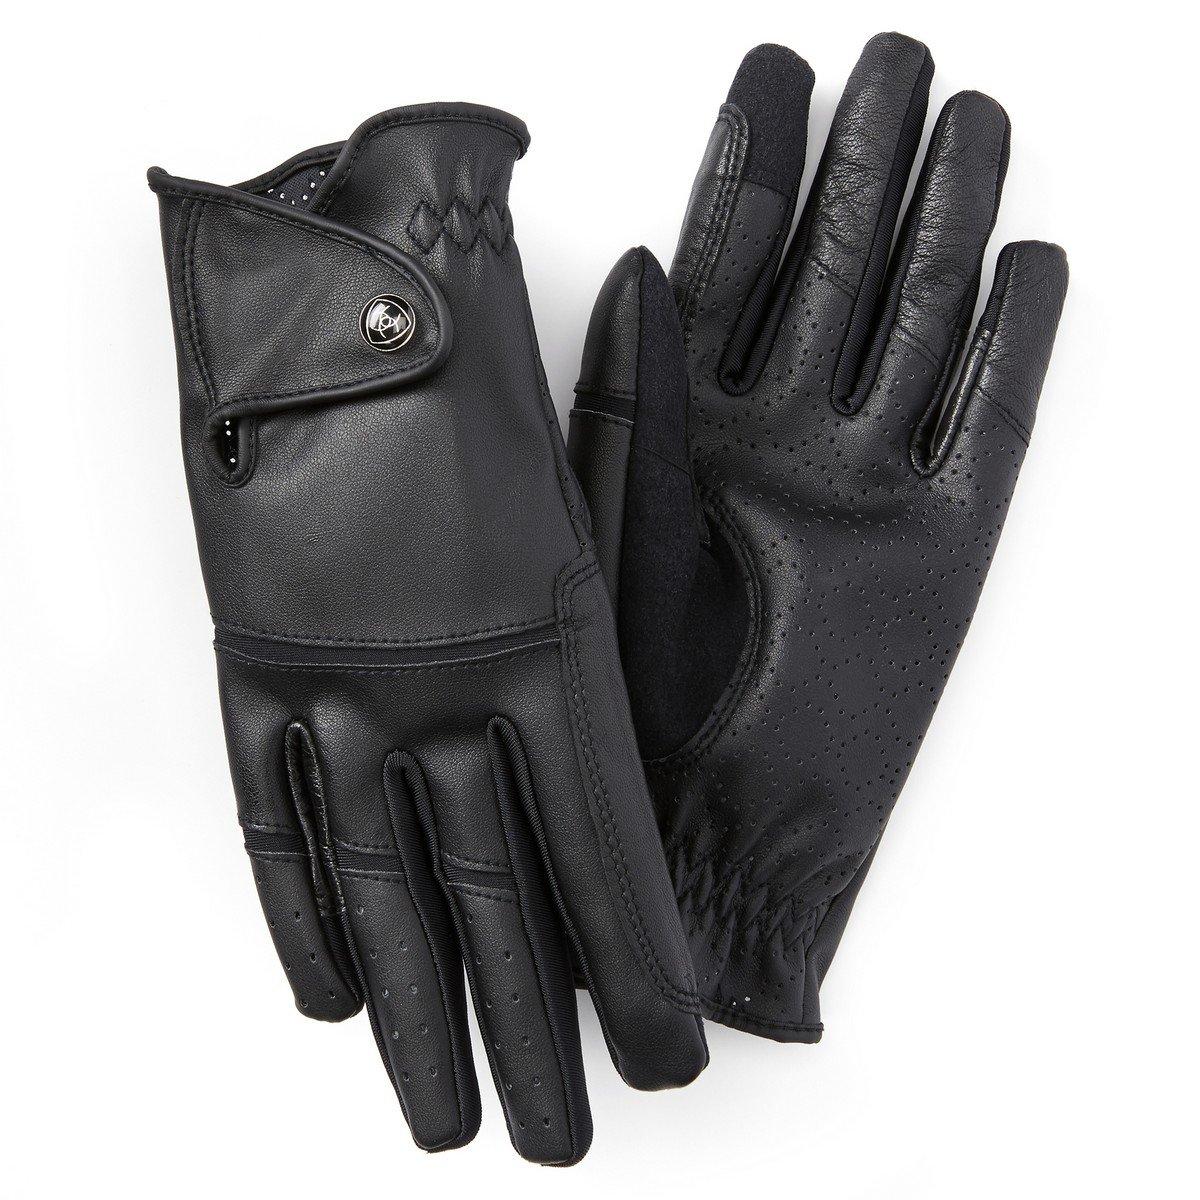 Imagem de Ariat Riding Gloves Elite Grip Adult Black 6,5